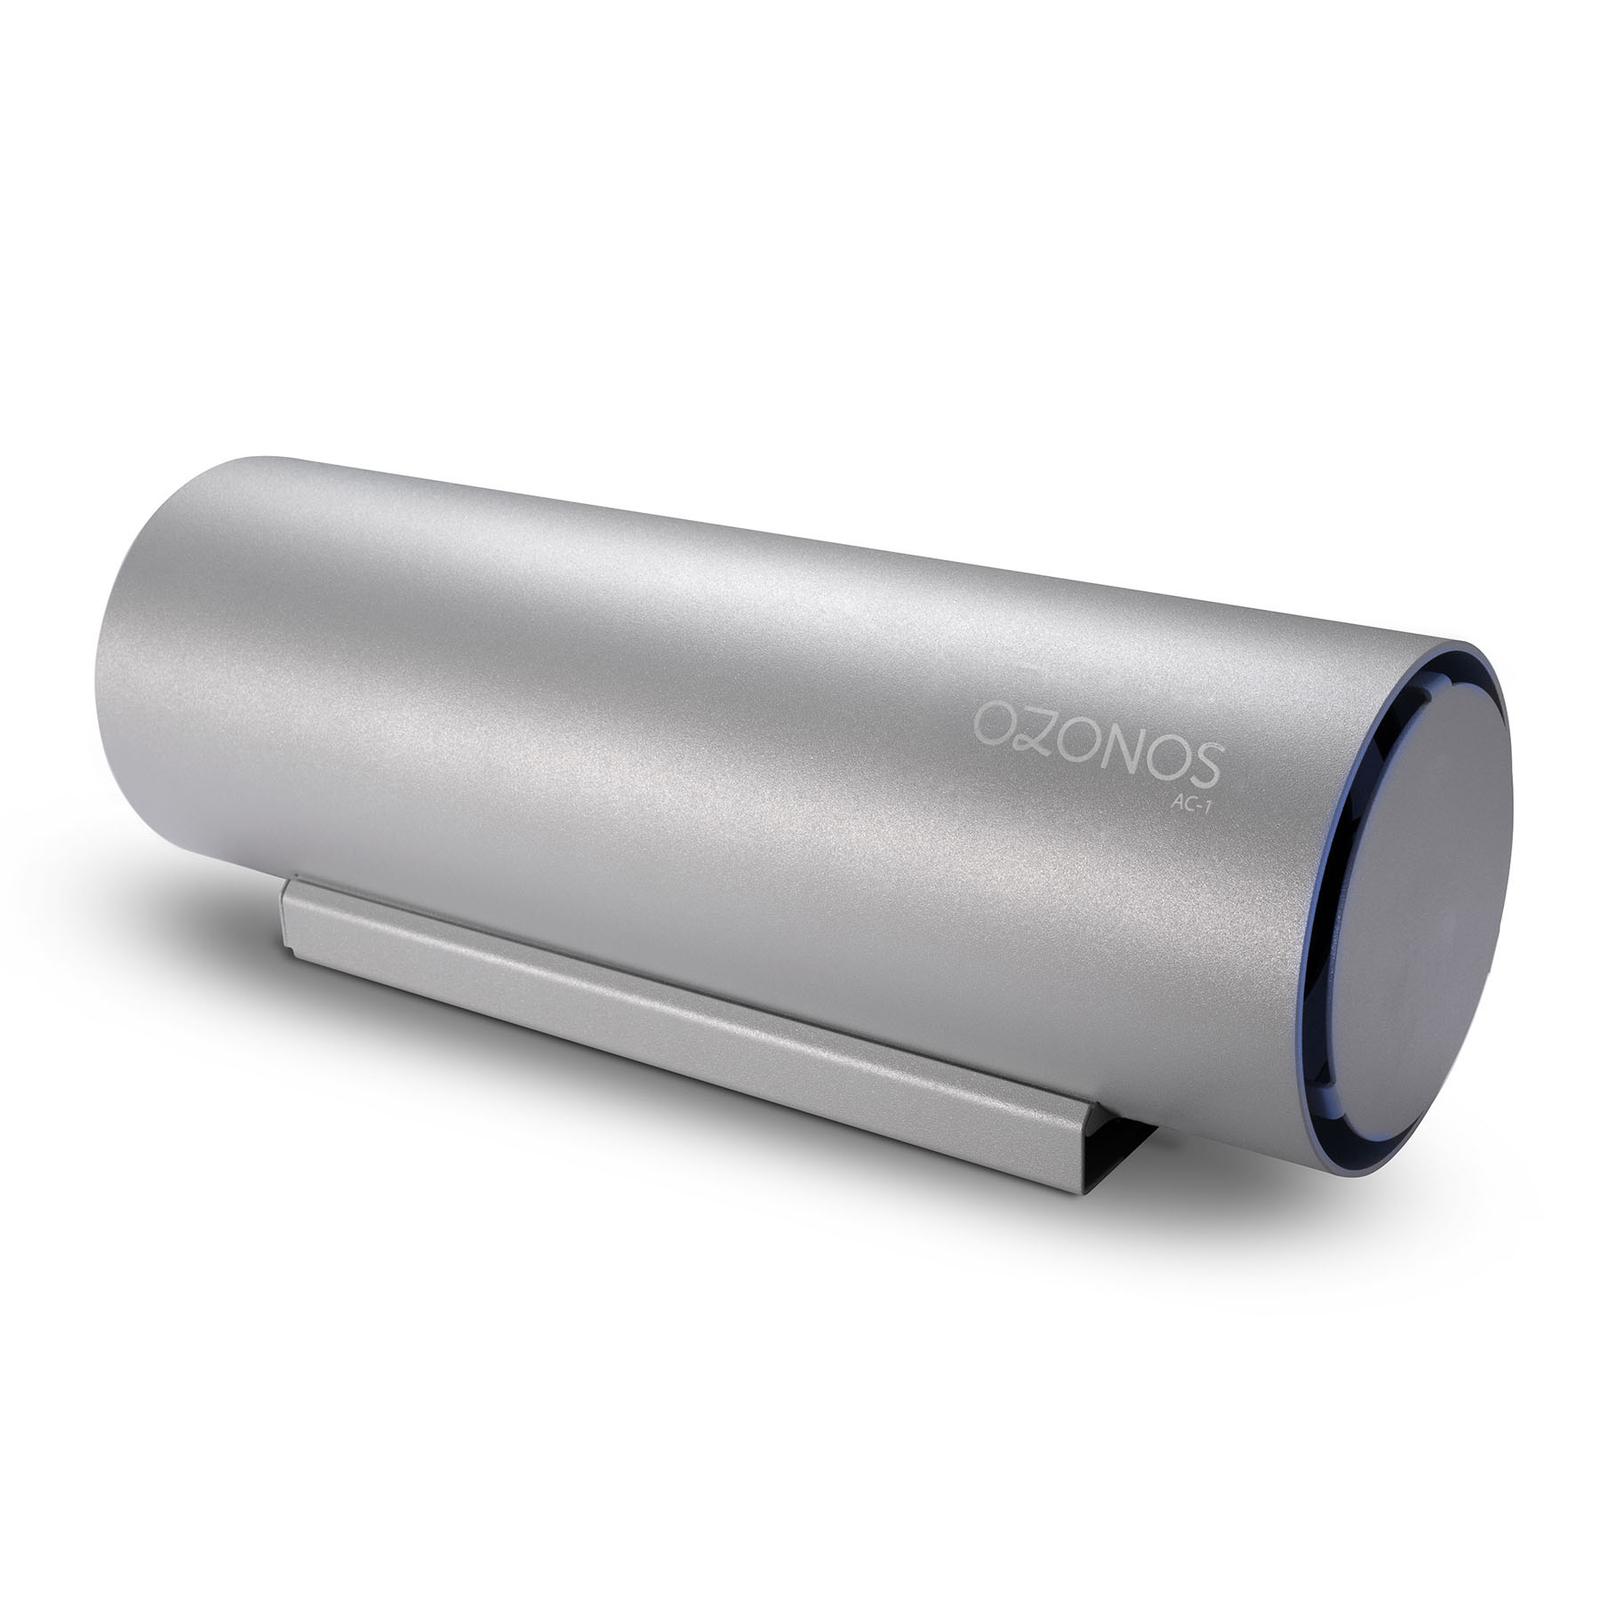 Ozonos AC-1 Pro luftrenser 0,210 ppm O3, sølv